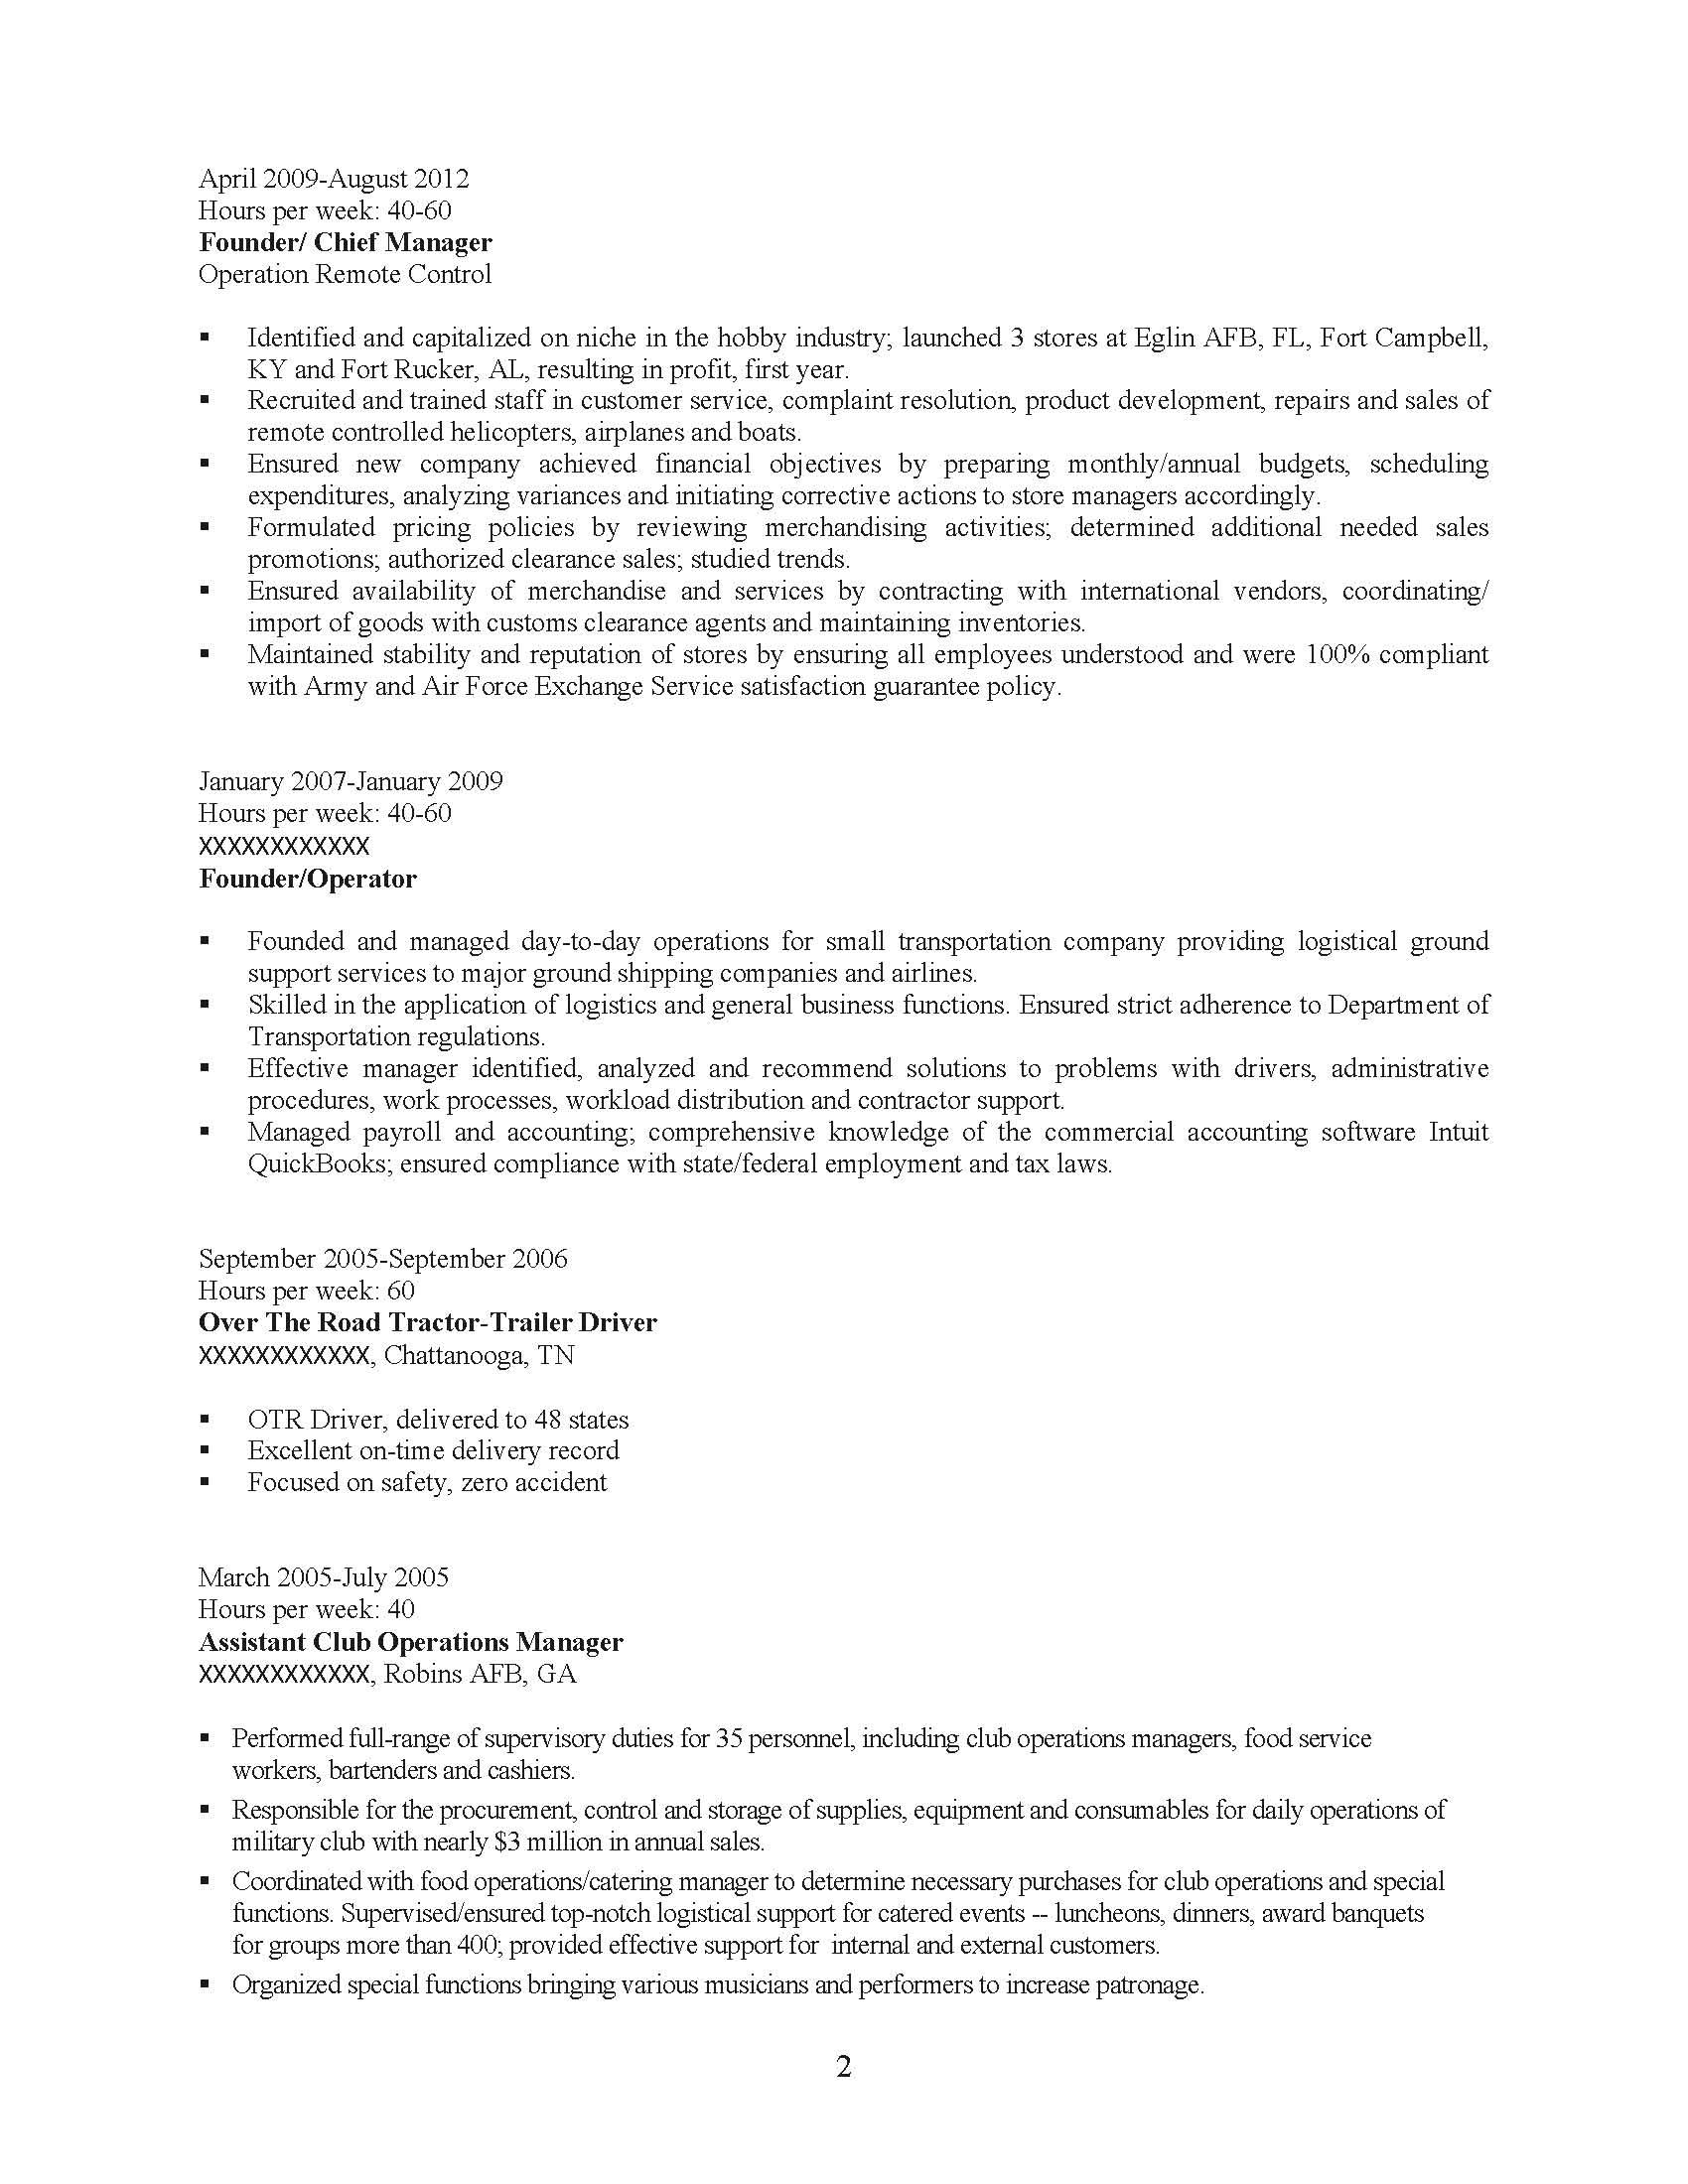 Custom resume writing 8th edition